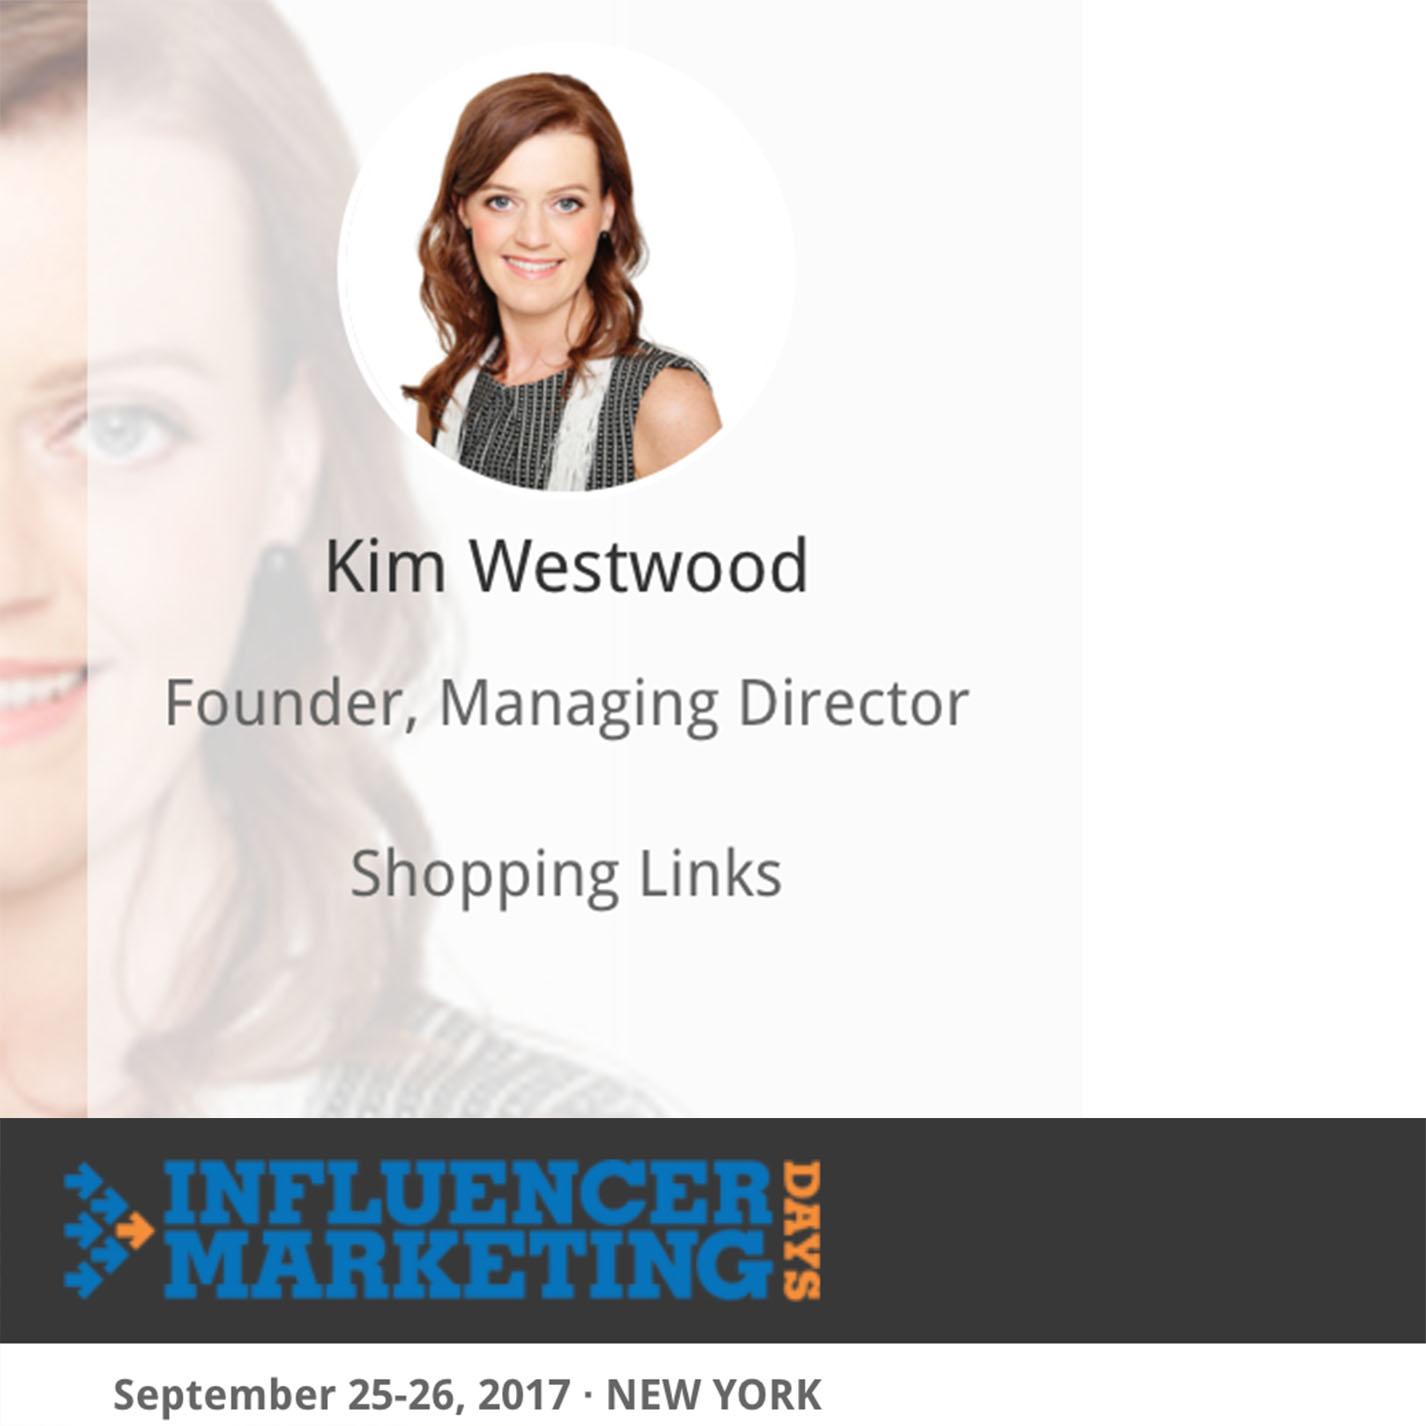 Shopping Links Founder Kim Westwood to Speak at Influencer Marketing Days 2017